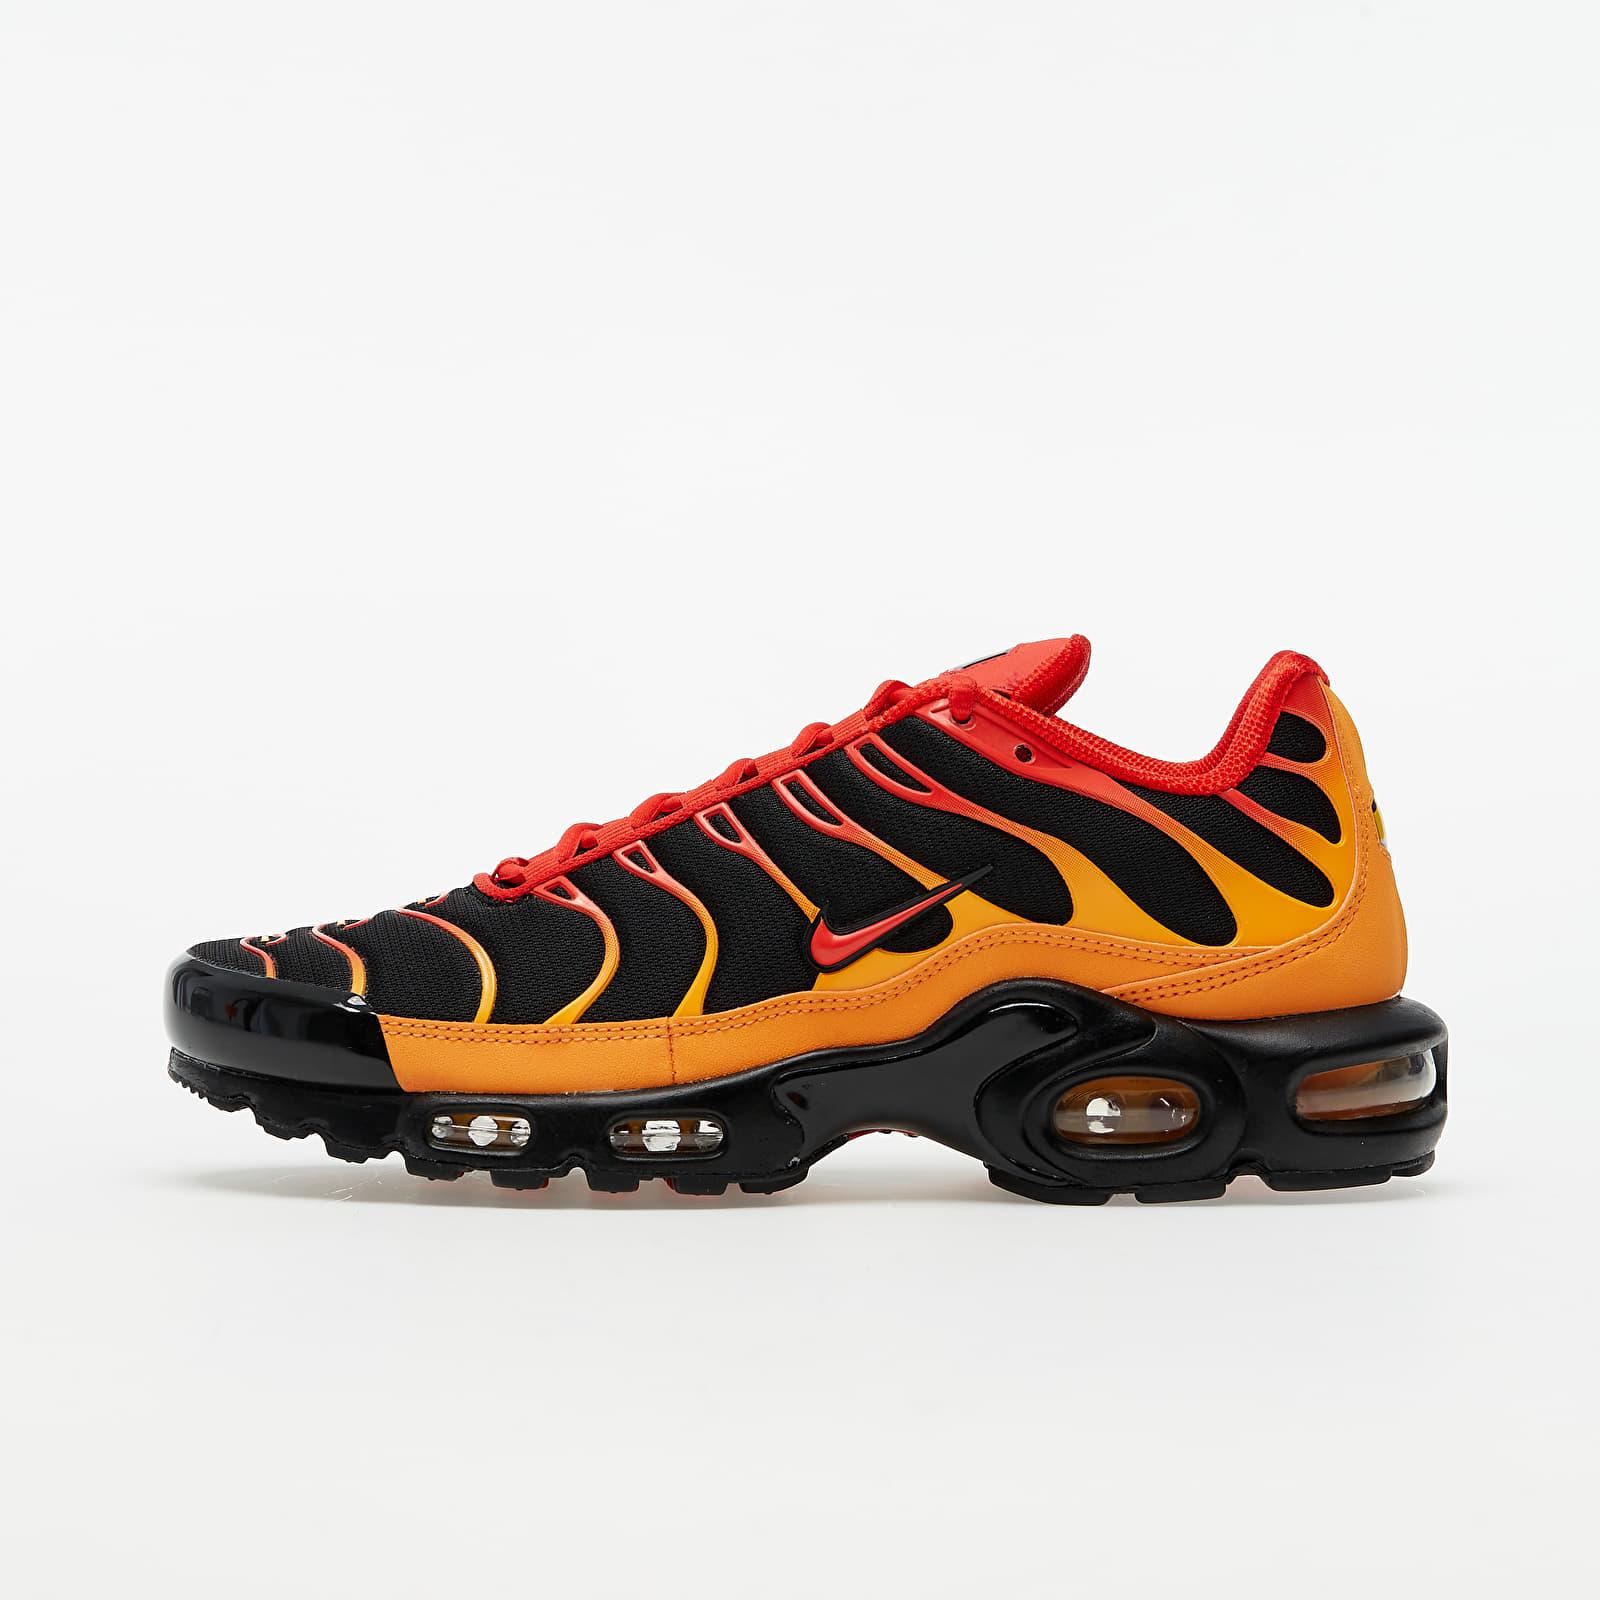 Nike Air Max Plus Black/ Chile Red-Vivid Orange EUR 42.5